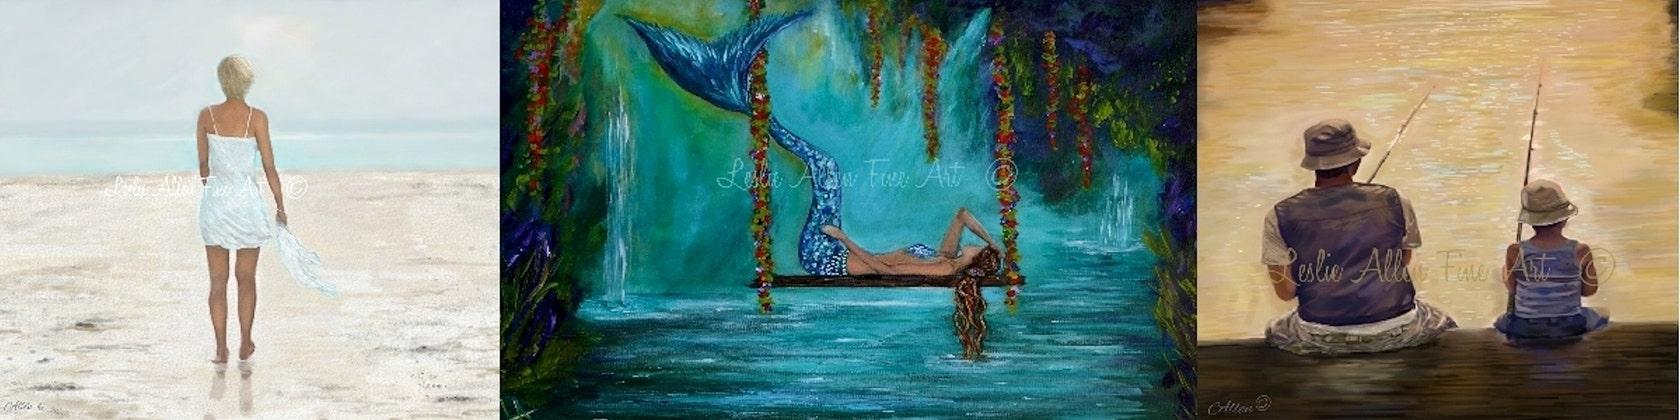 Leslieallenfineart original fine art paintings prints